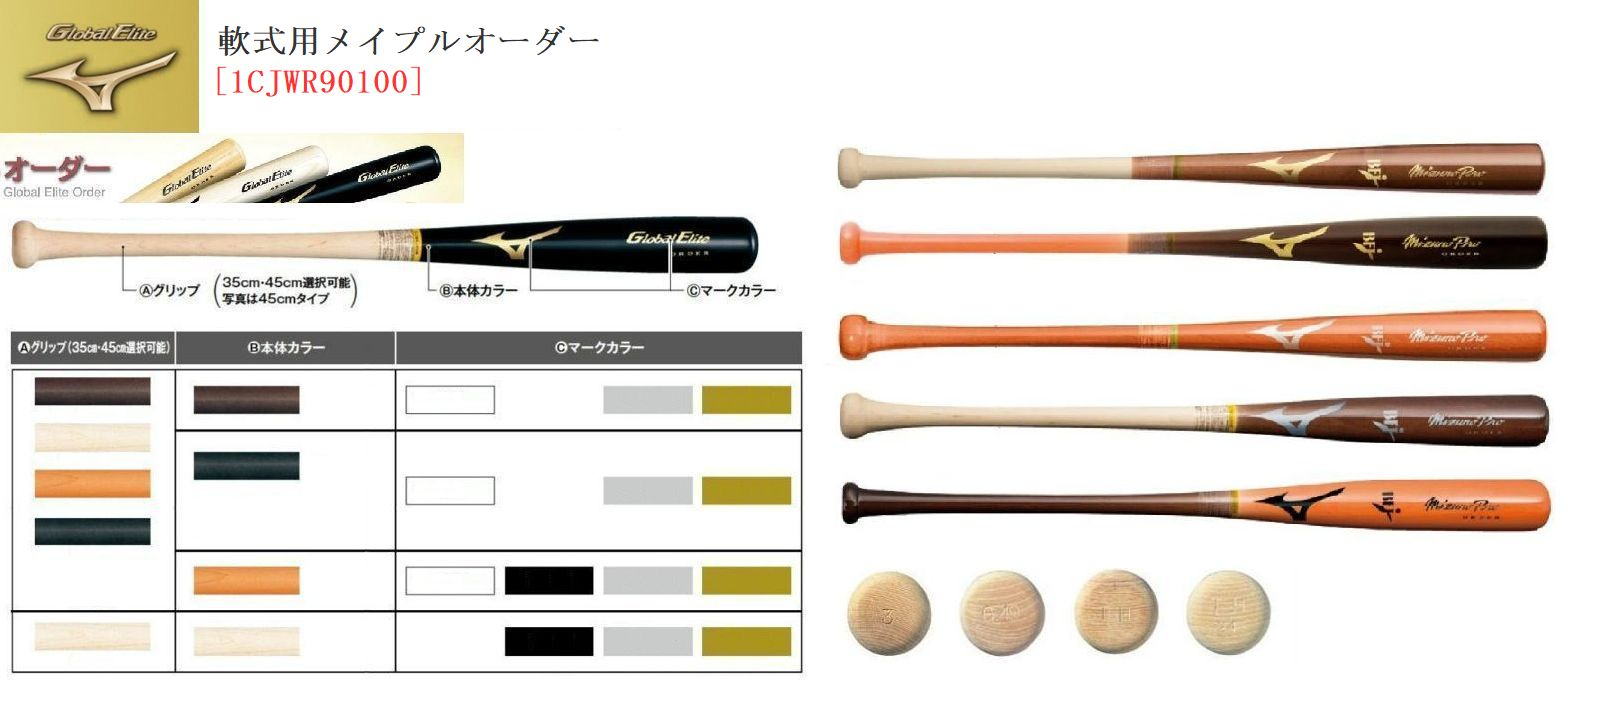 【Mizuno Global Elite~ミズノ・グローバルエリート】野球バットオーダー オーダー野球バット 木製バットオーダーミズノ オーダーバット軟式バットオーダー野球軟式用木製バットオーダーメイプルオーダー